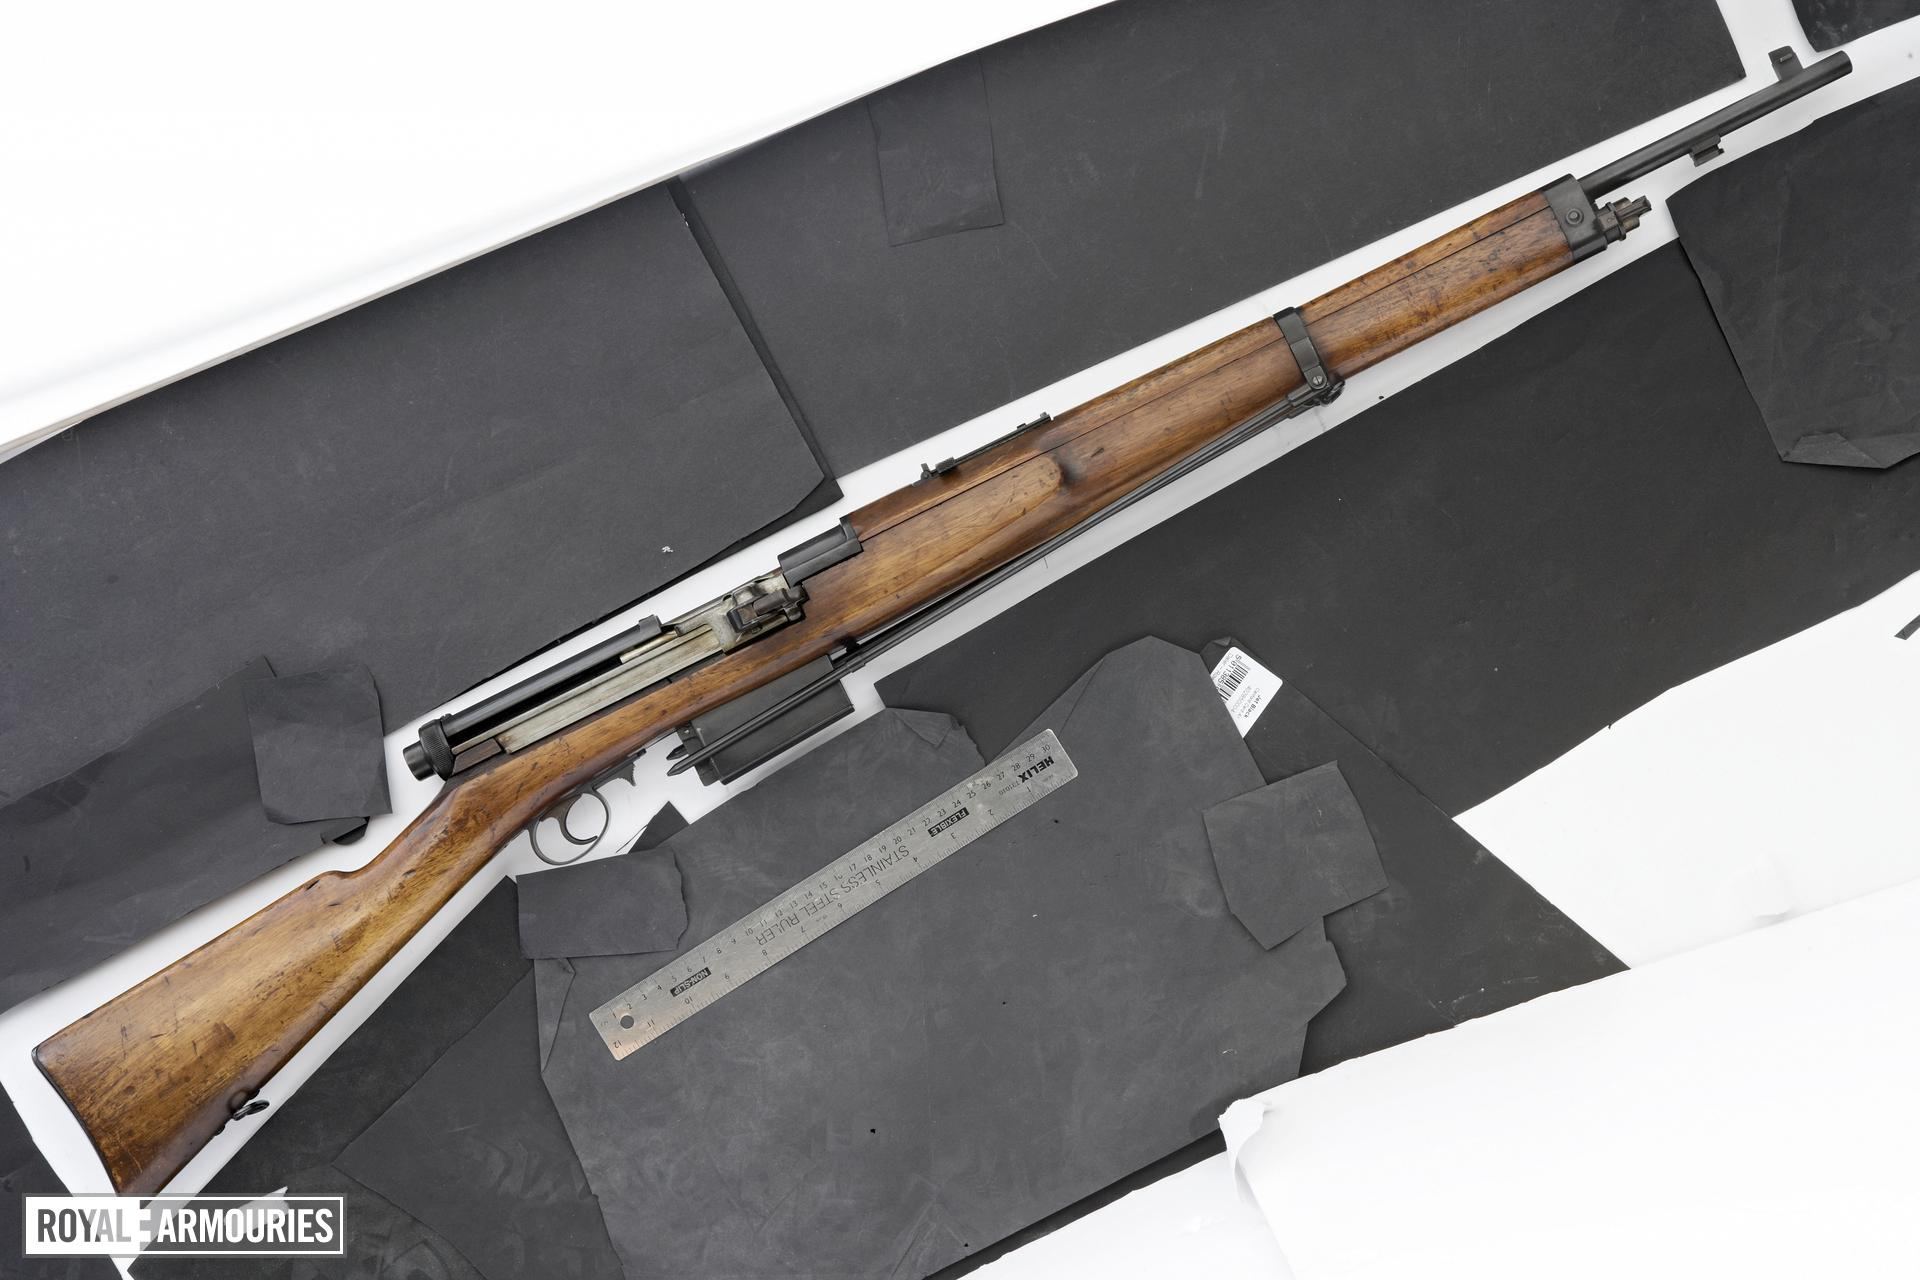 Centrefire self-loading rifle - Mondragon Model 1908